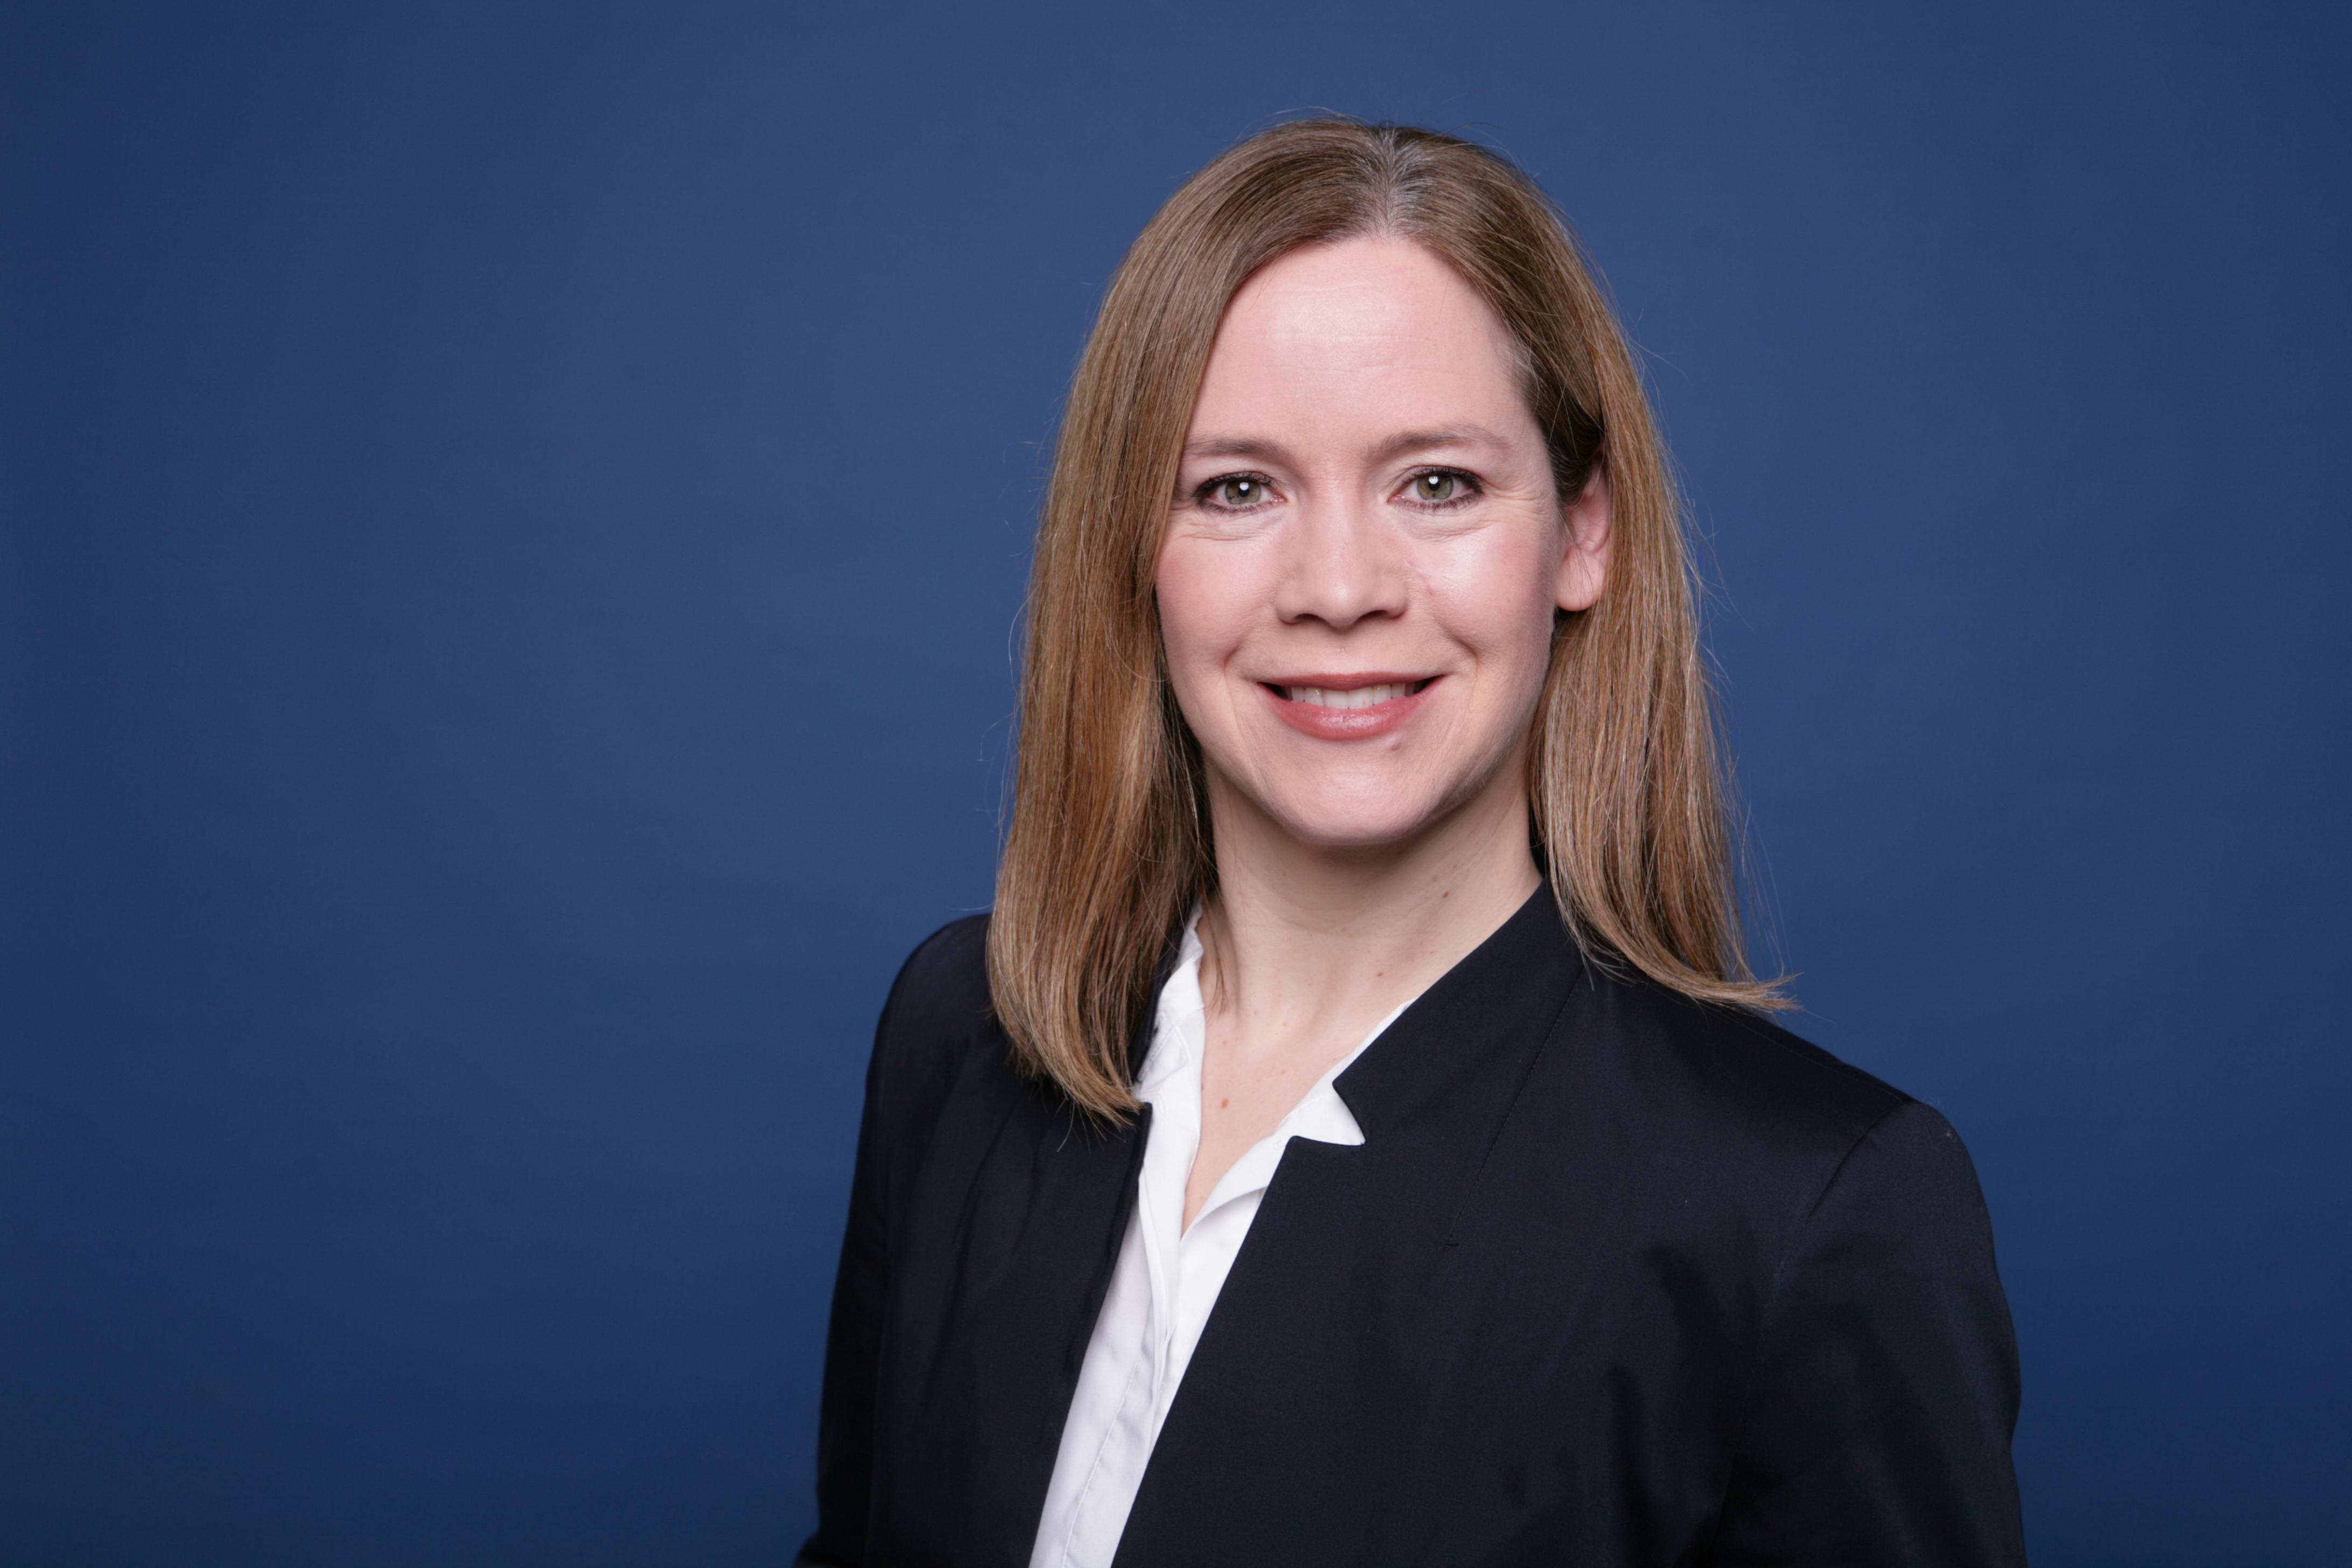 Kristina Gude